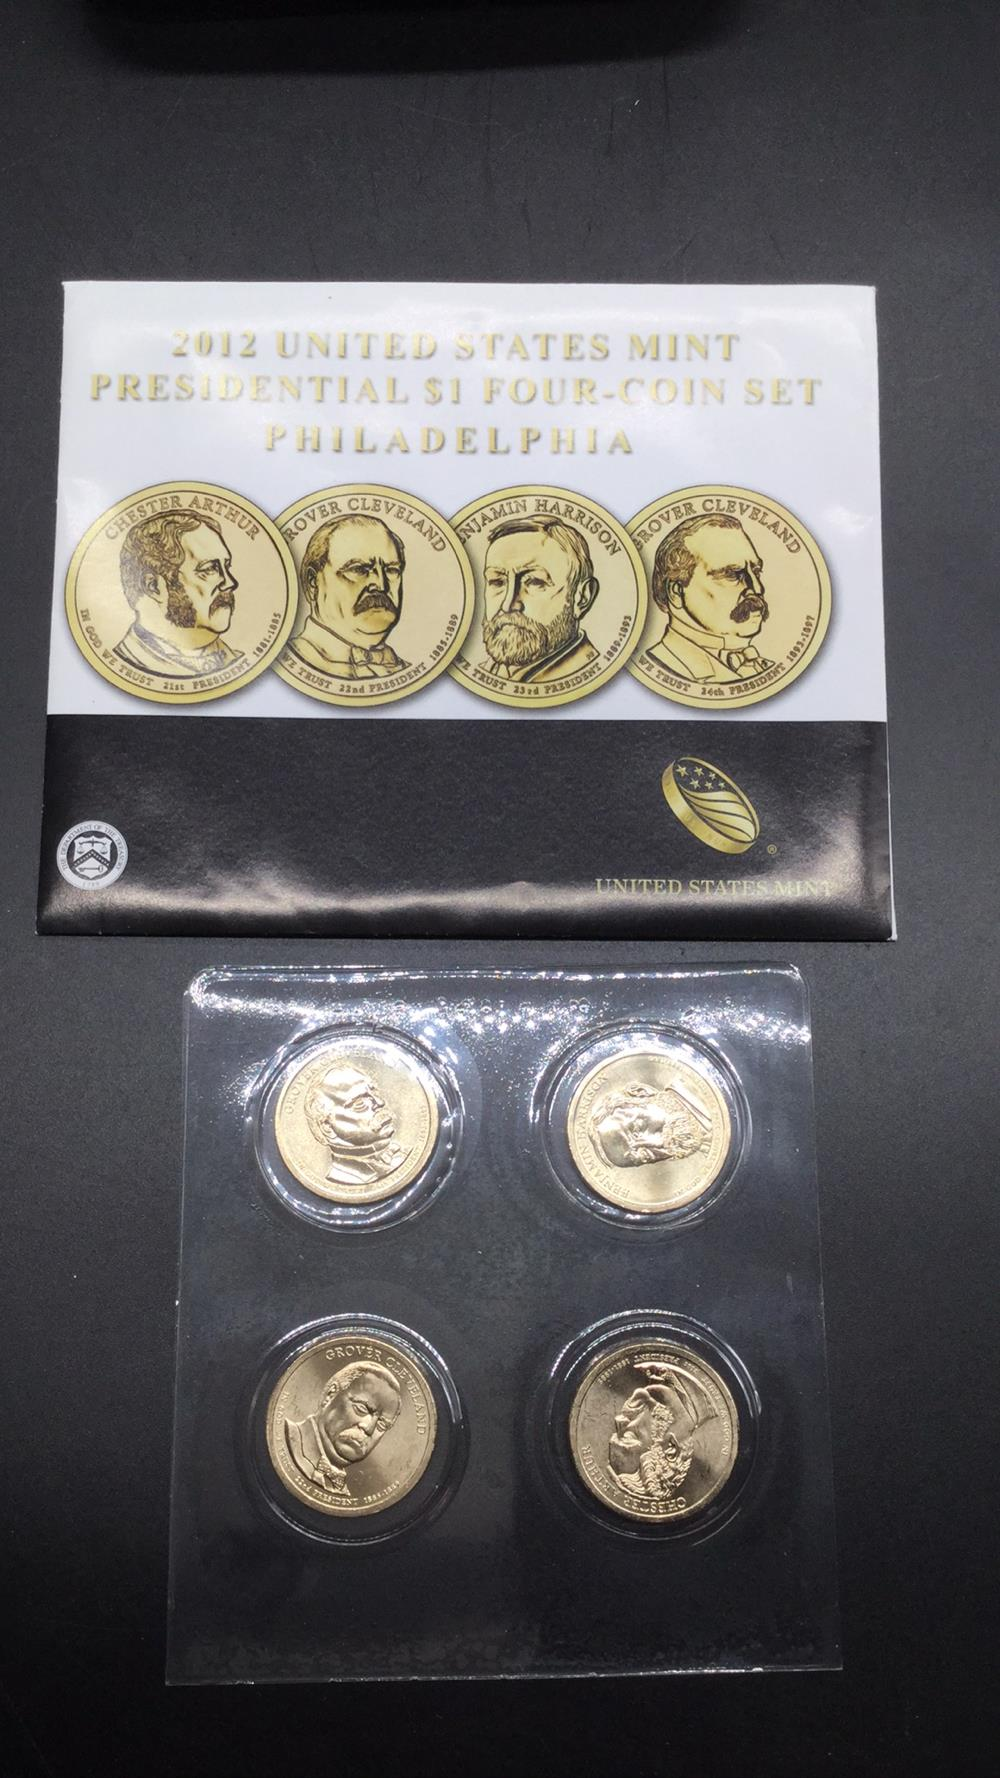 2012 United States mint